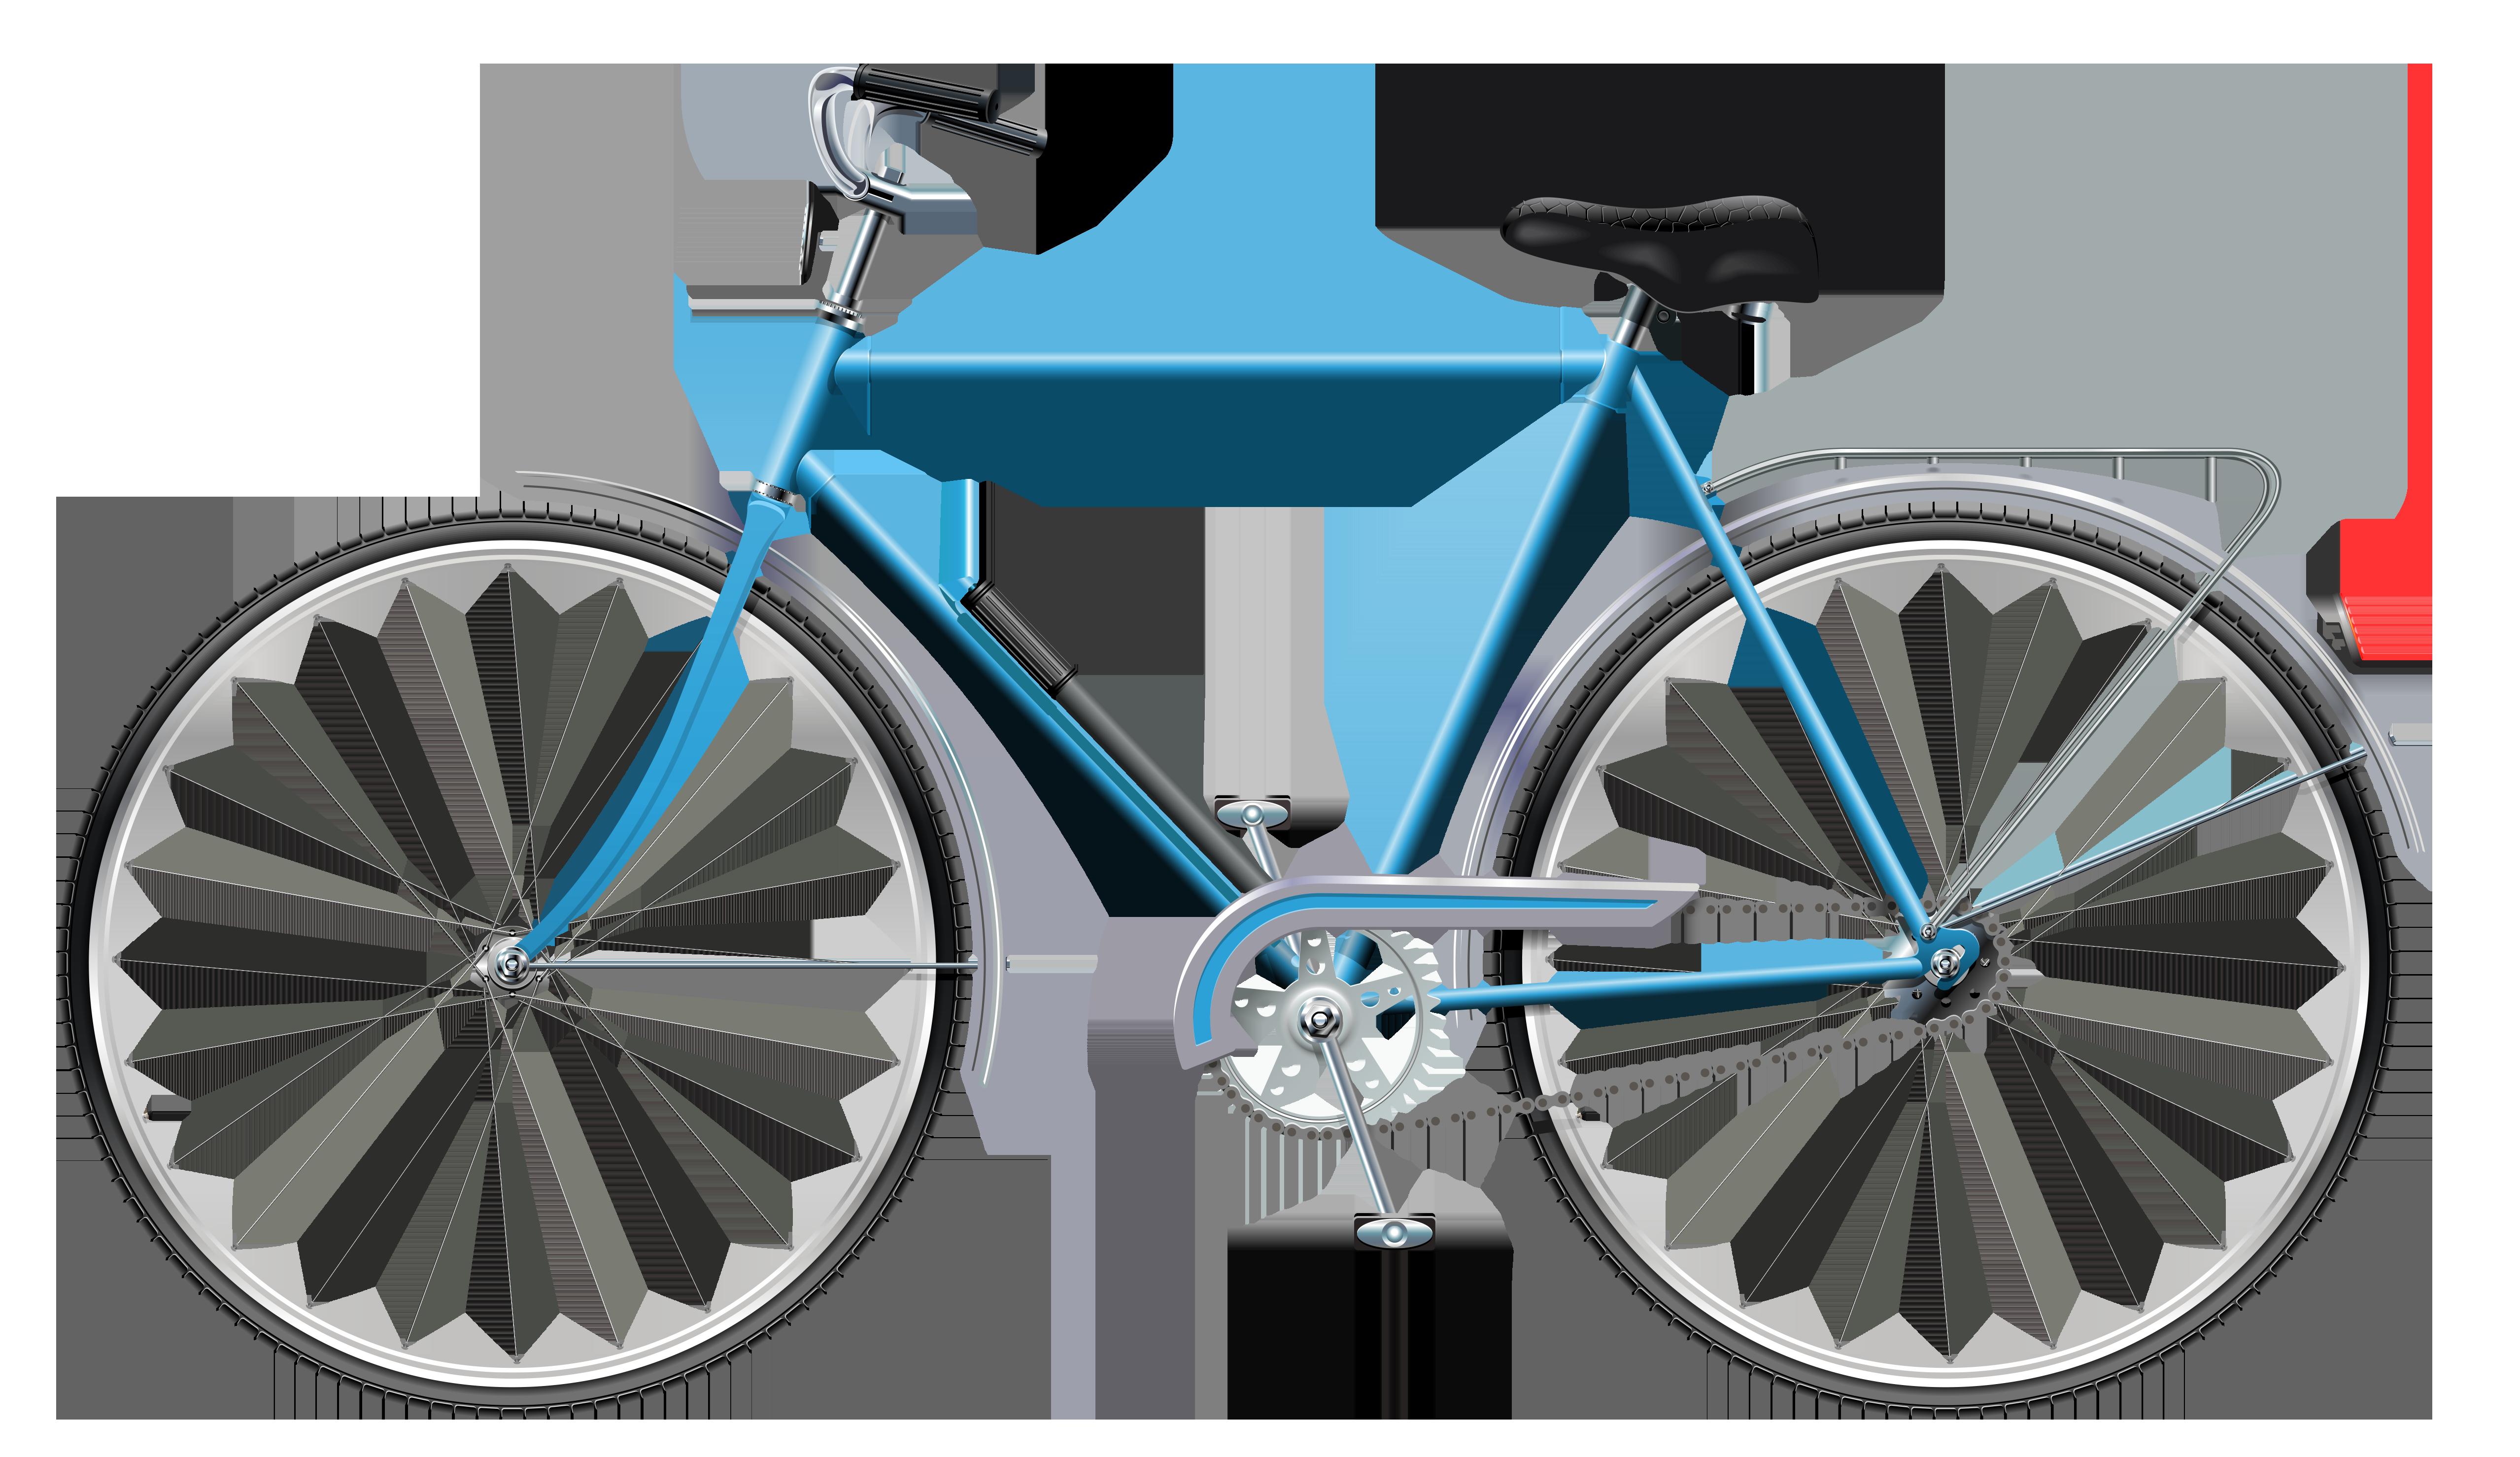 Clipart bicycle transparent background. Blue png clip art